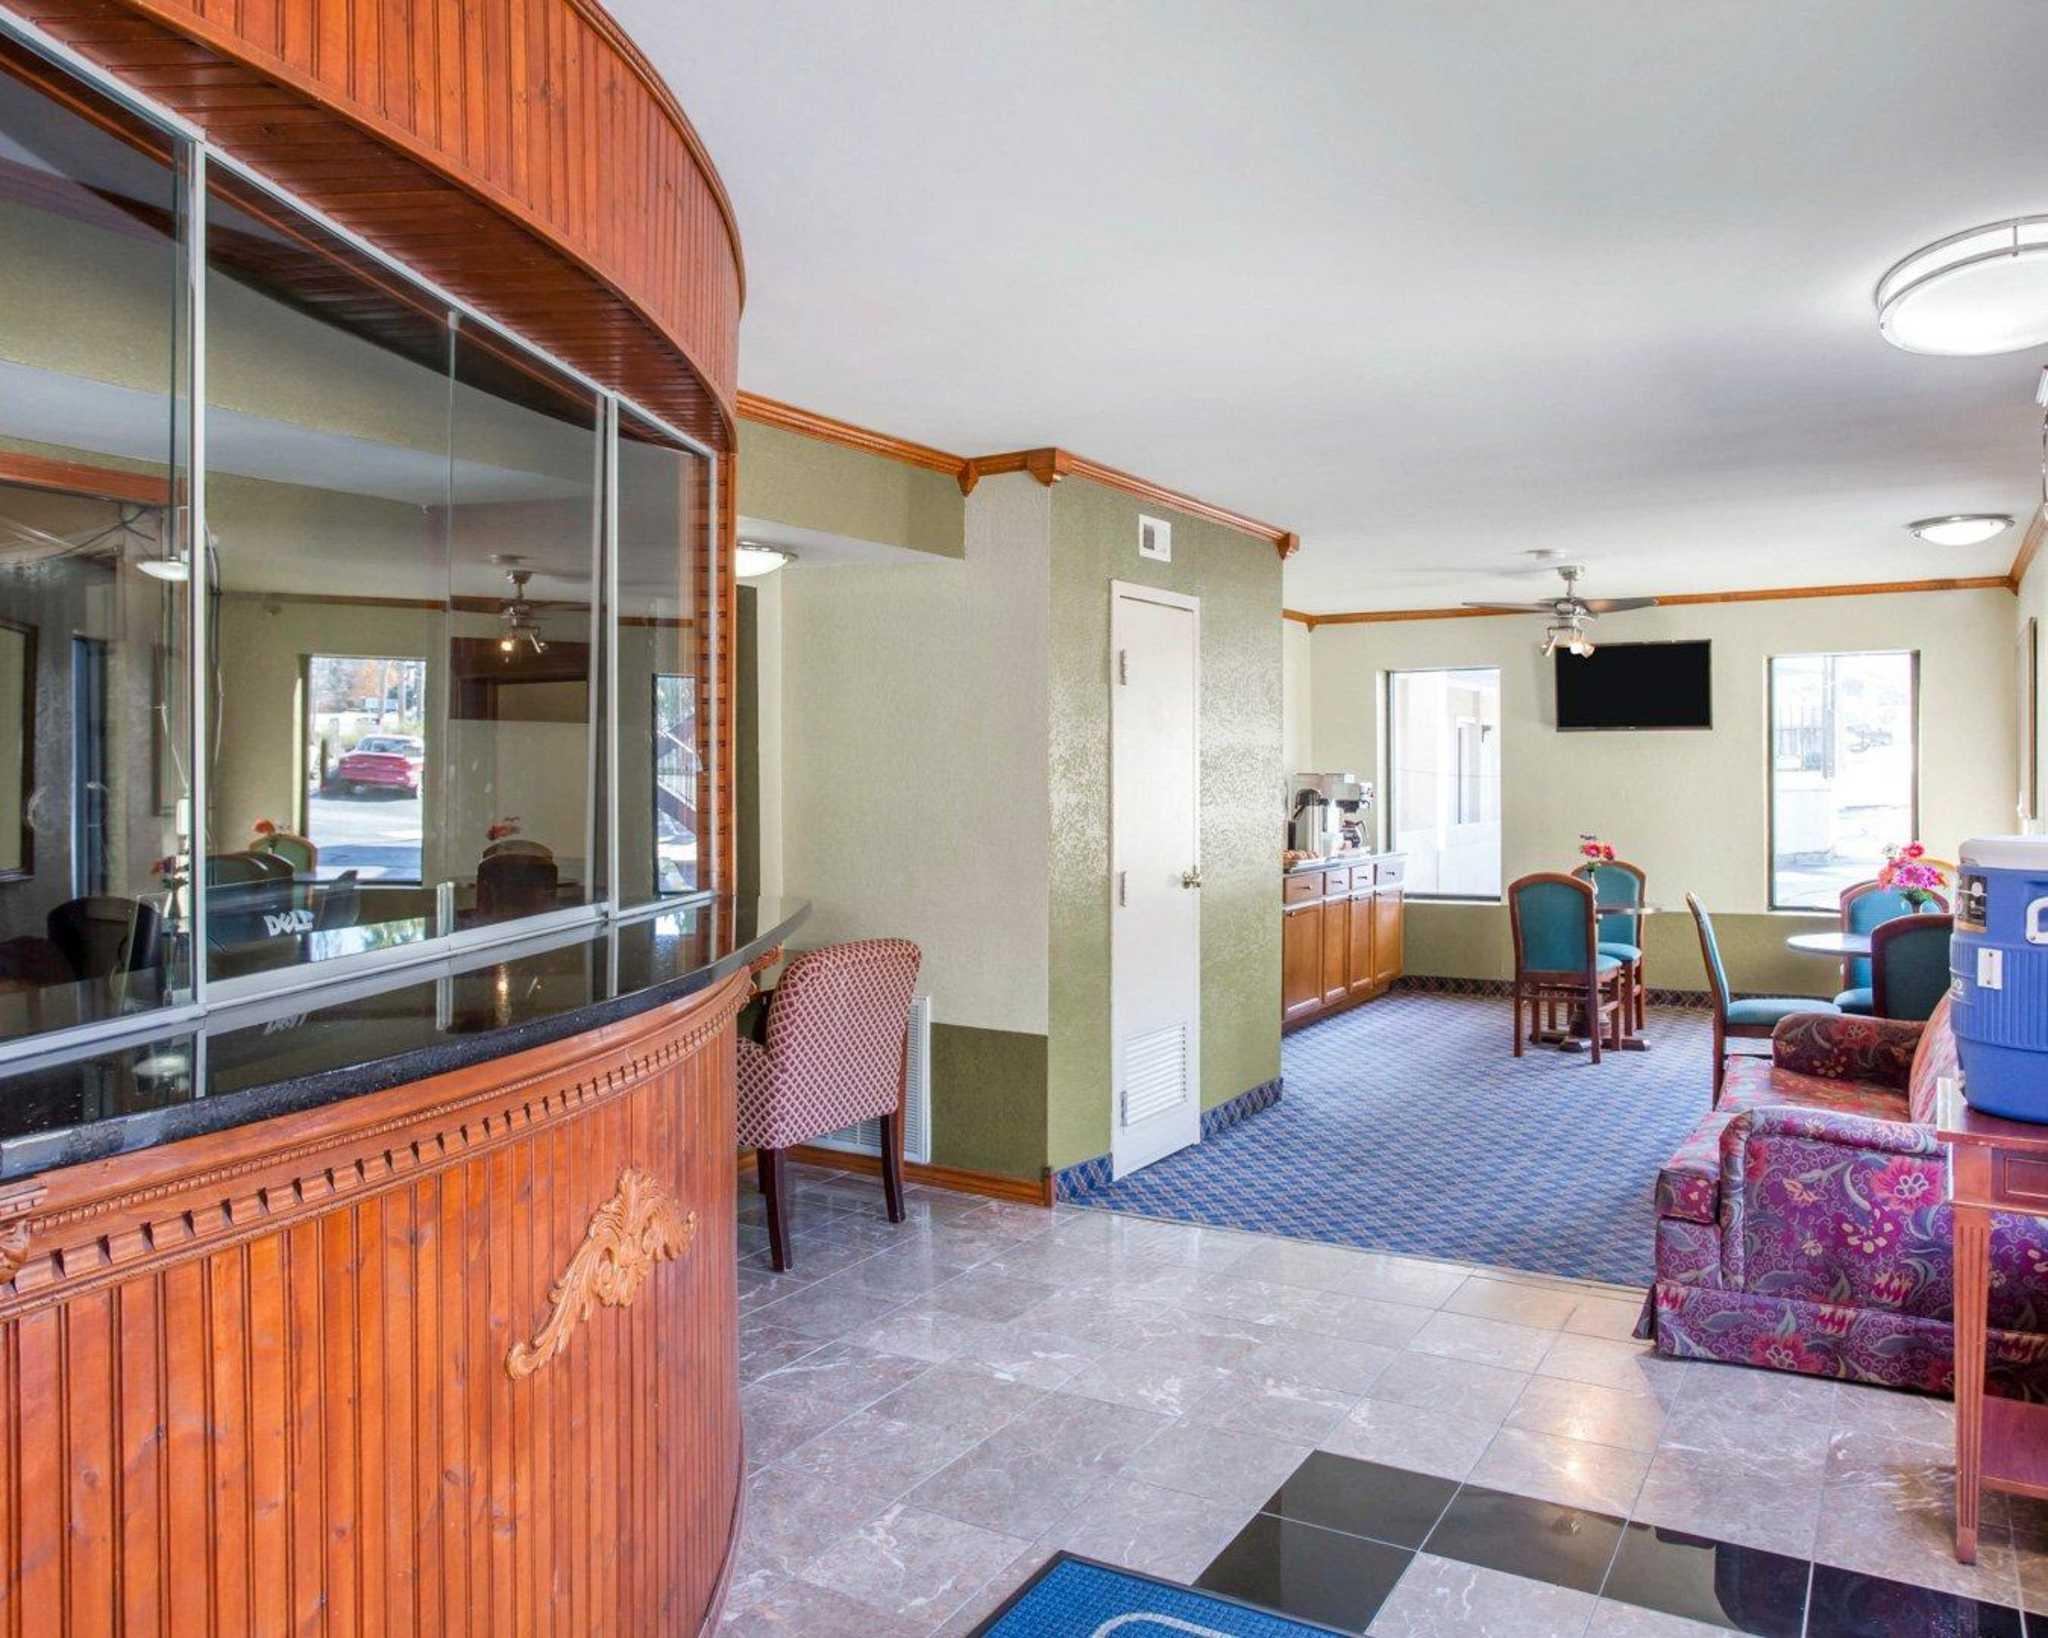 Rodeway Inn & Suites Fort Jackson image 13